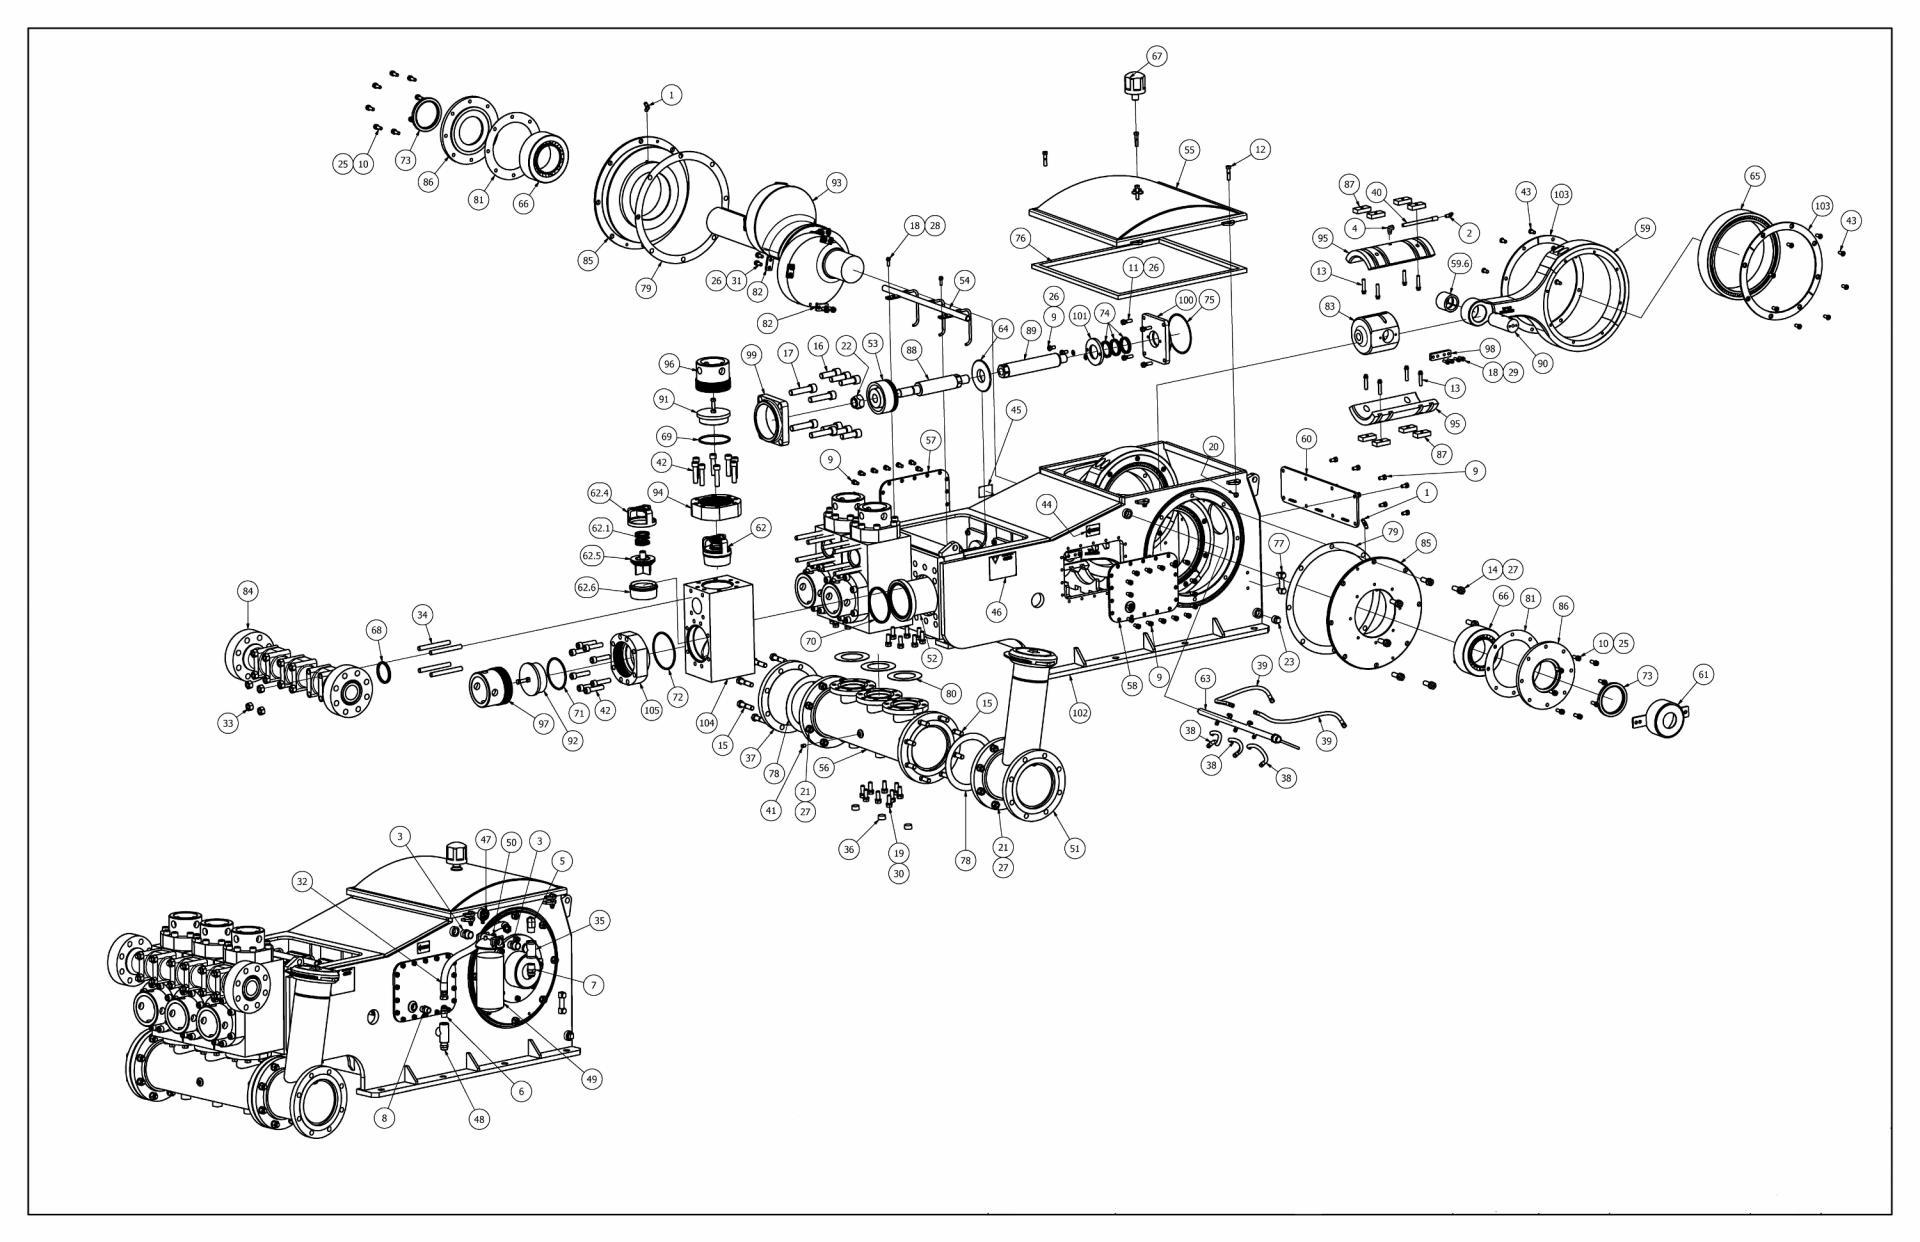 TT-680 Pump Parts View Full Open Valves